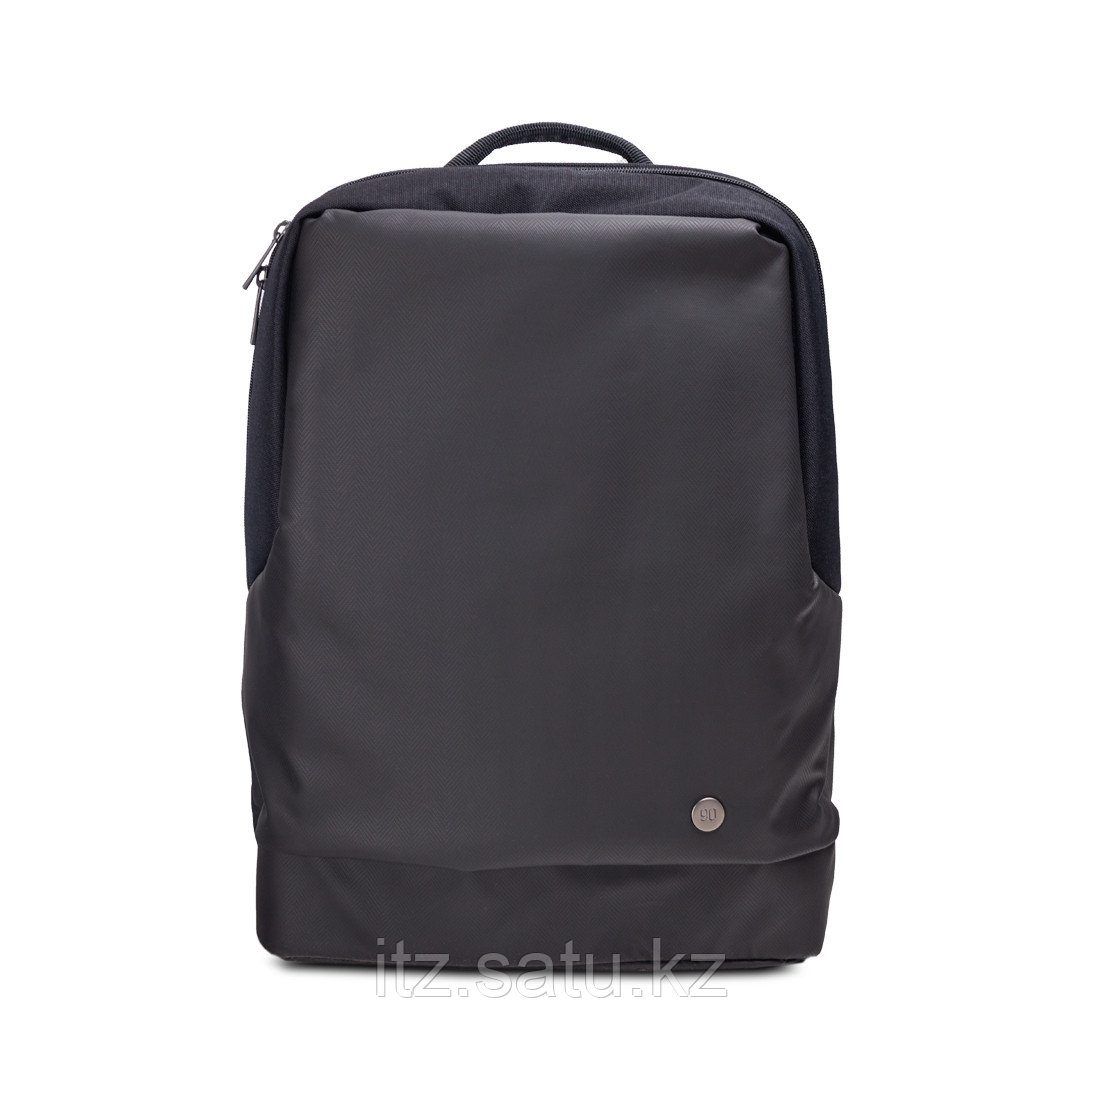 Рюкзак Xiaomi 90 Points Urban Commuting Backpack Черный